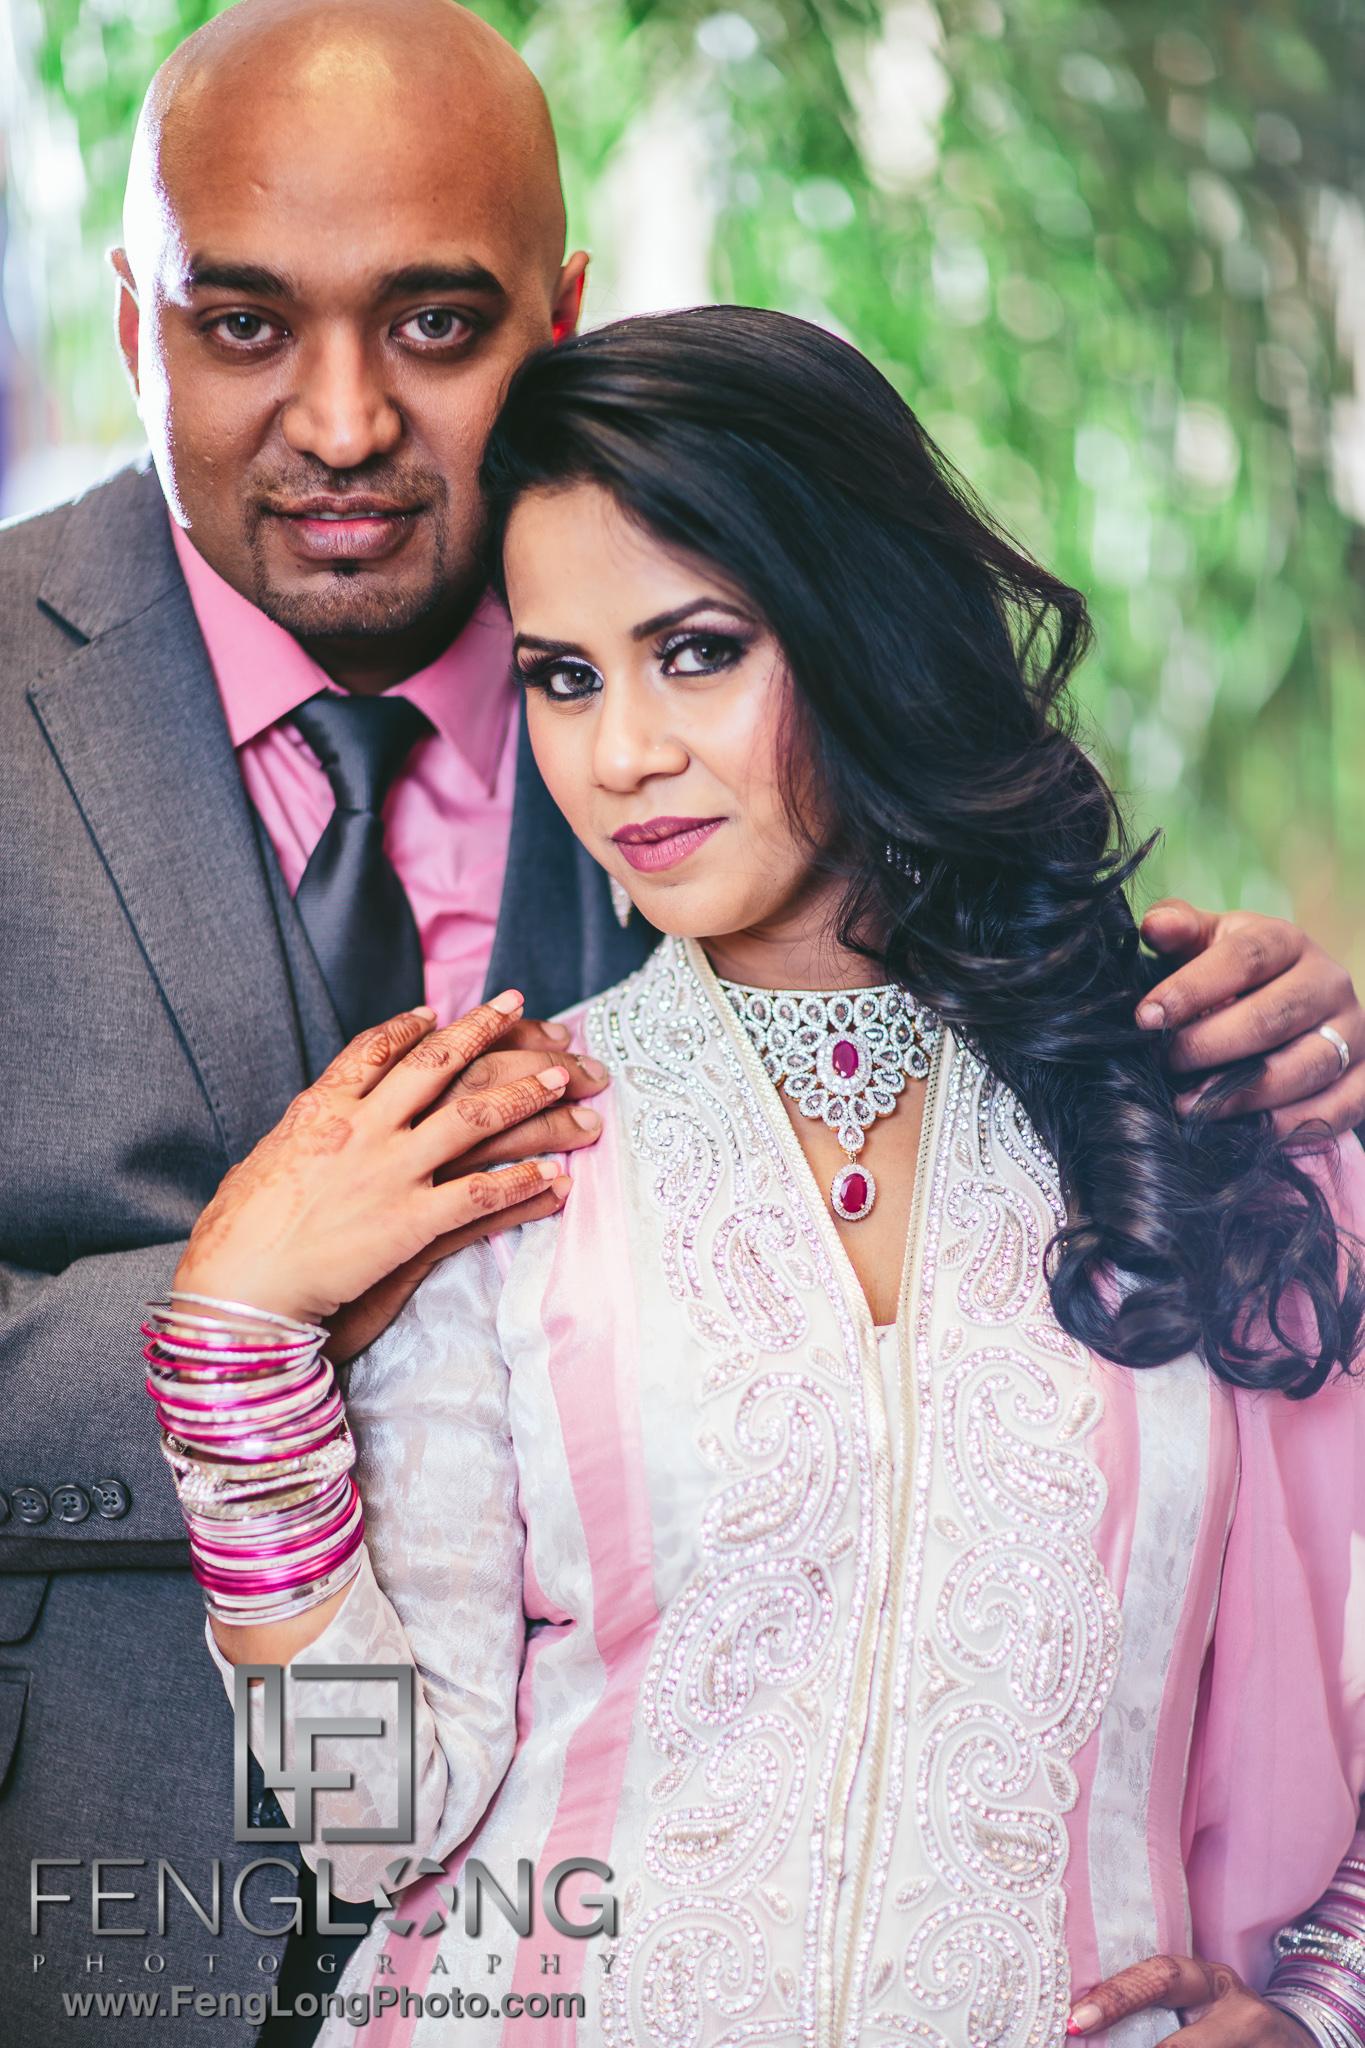 atlanta-bengali-indian-wedding-engagement-6771